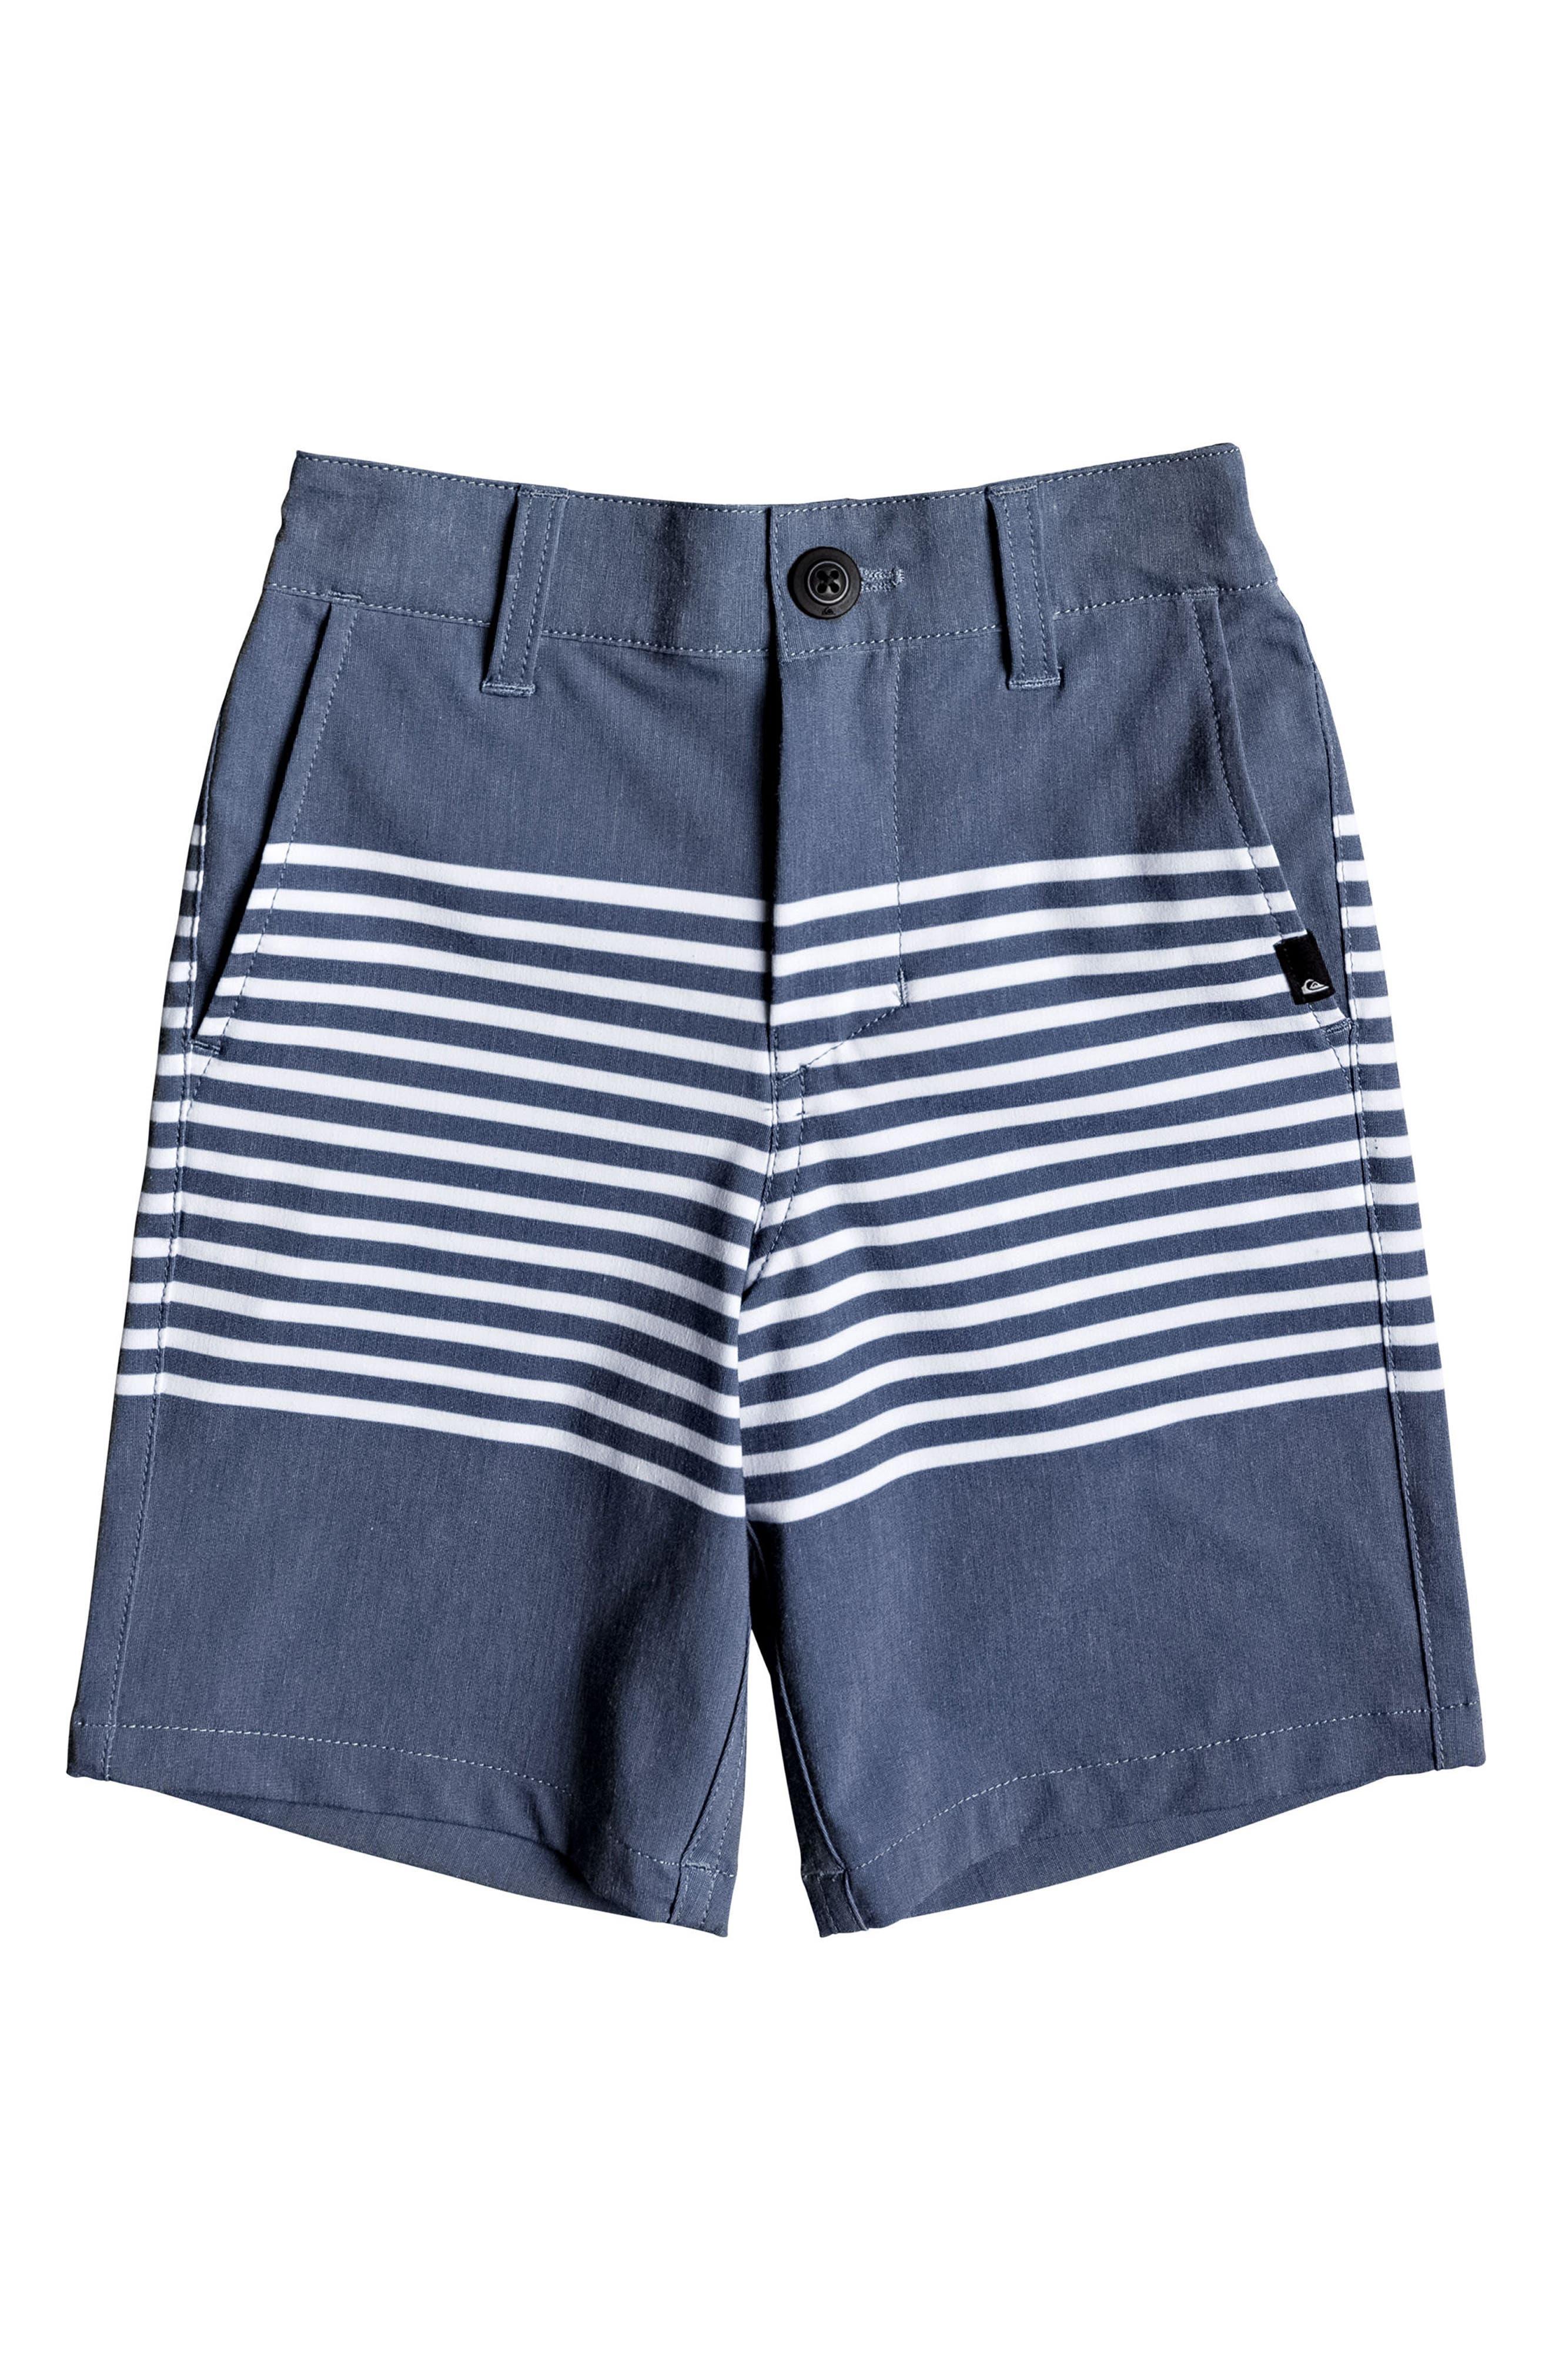 Echo Stripe Amphibian Board Shorts,                             Main thumbnail 1, color,                             Estate Blue